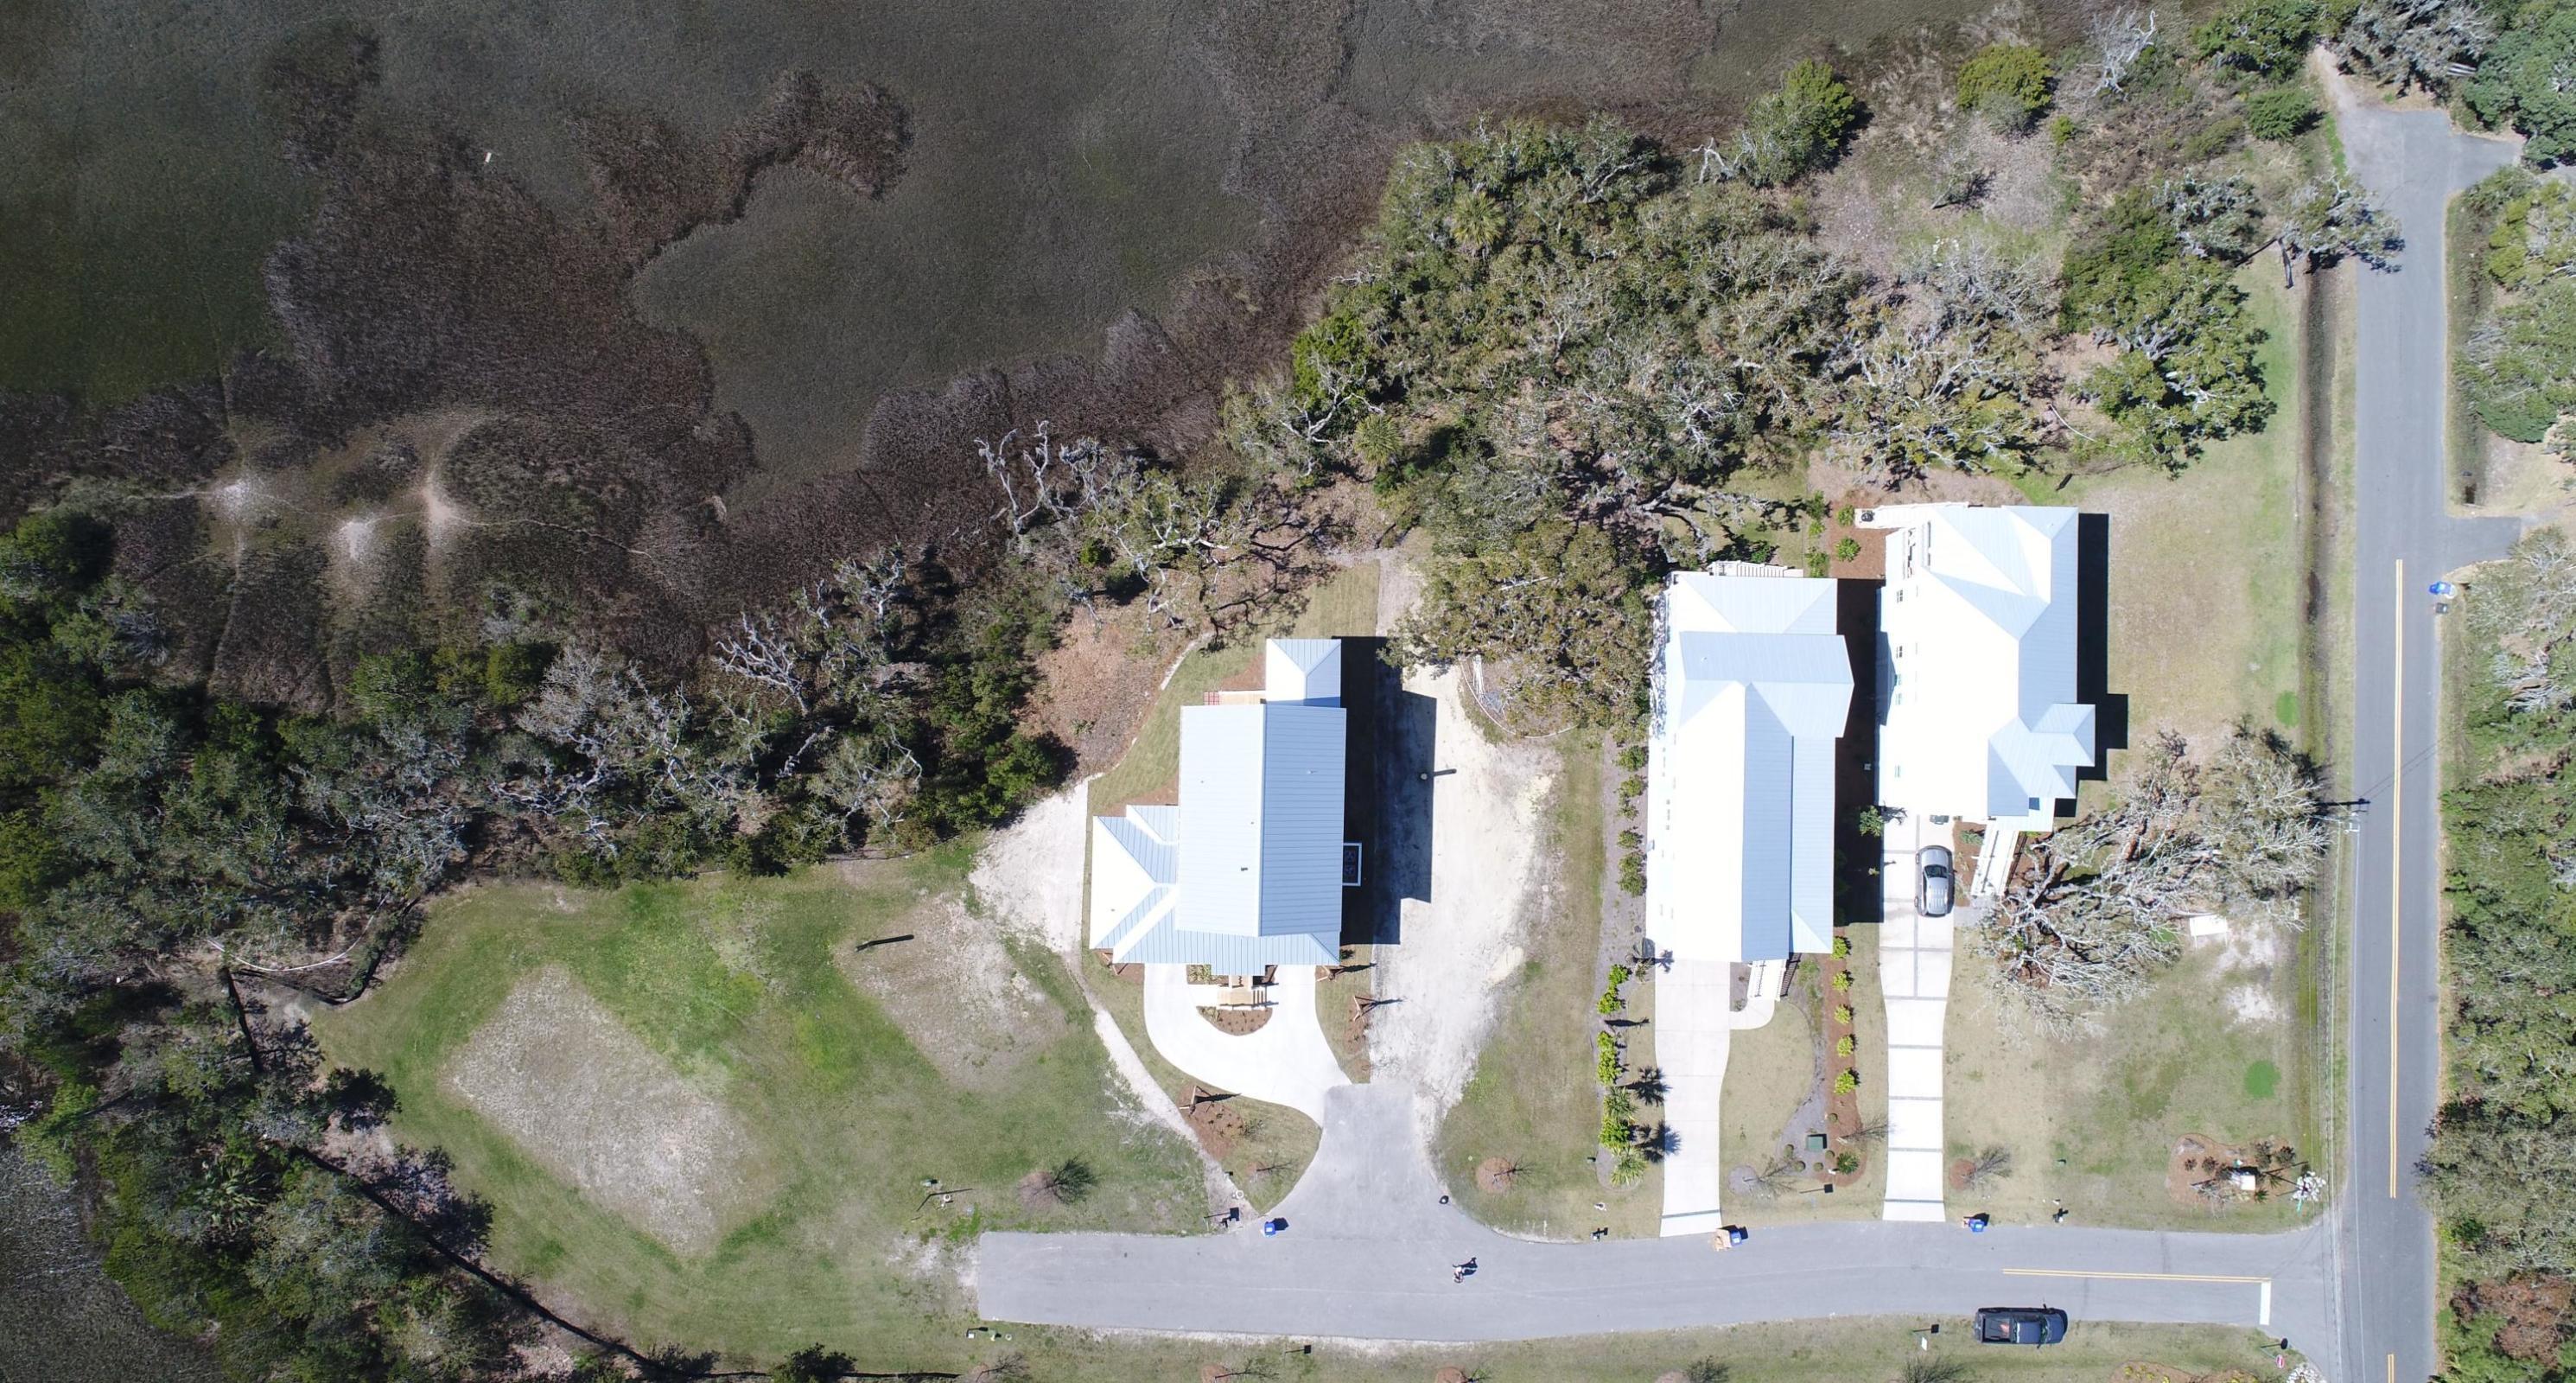 The Pointe At Stono Shores Homes For Sale - 621 Stono Shores Point, Charleston, SC - 66